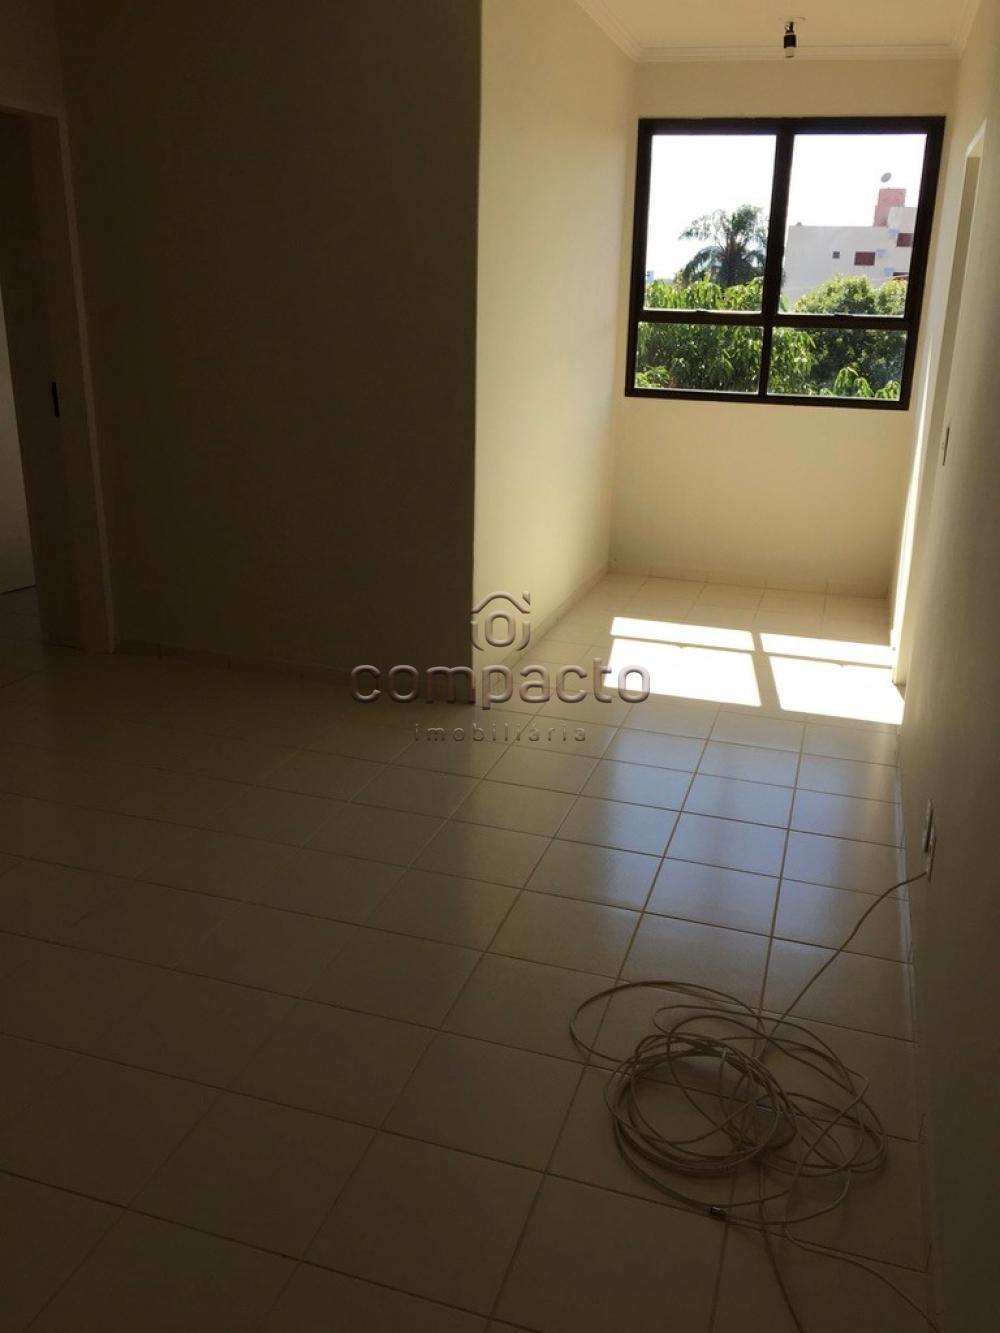 Sao Jose do Rio Preto Apartamento Venda R$200.000,00 Condominio R$330,00 3 Dormitorios 1 Suite Area construida 96.00m2